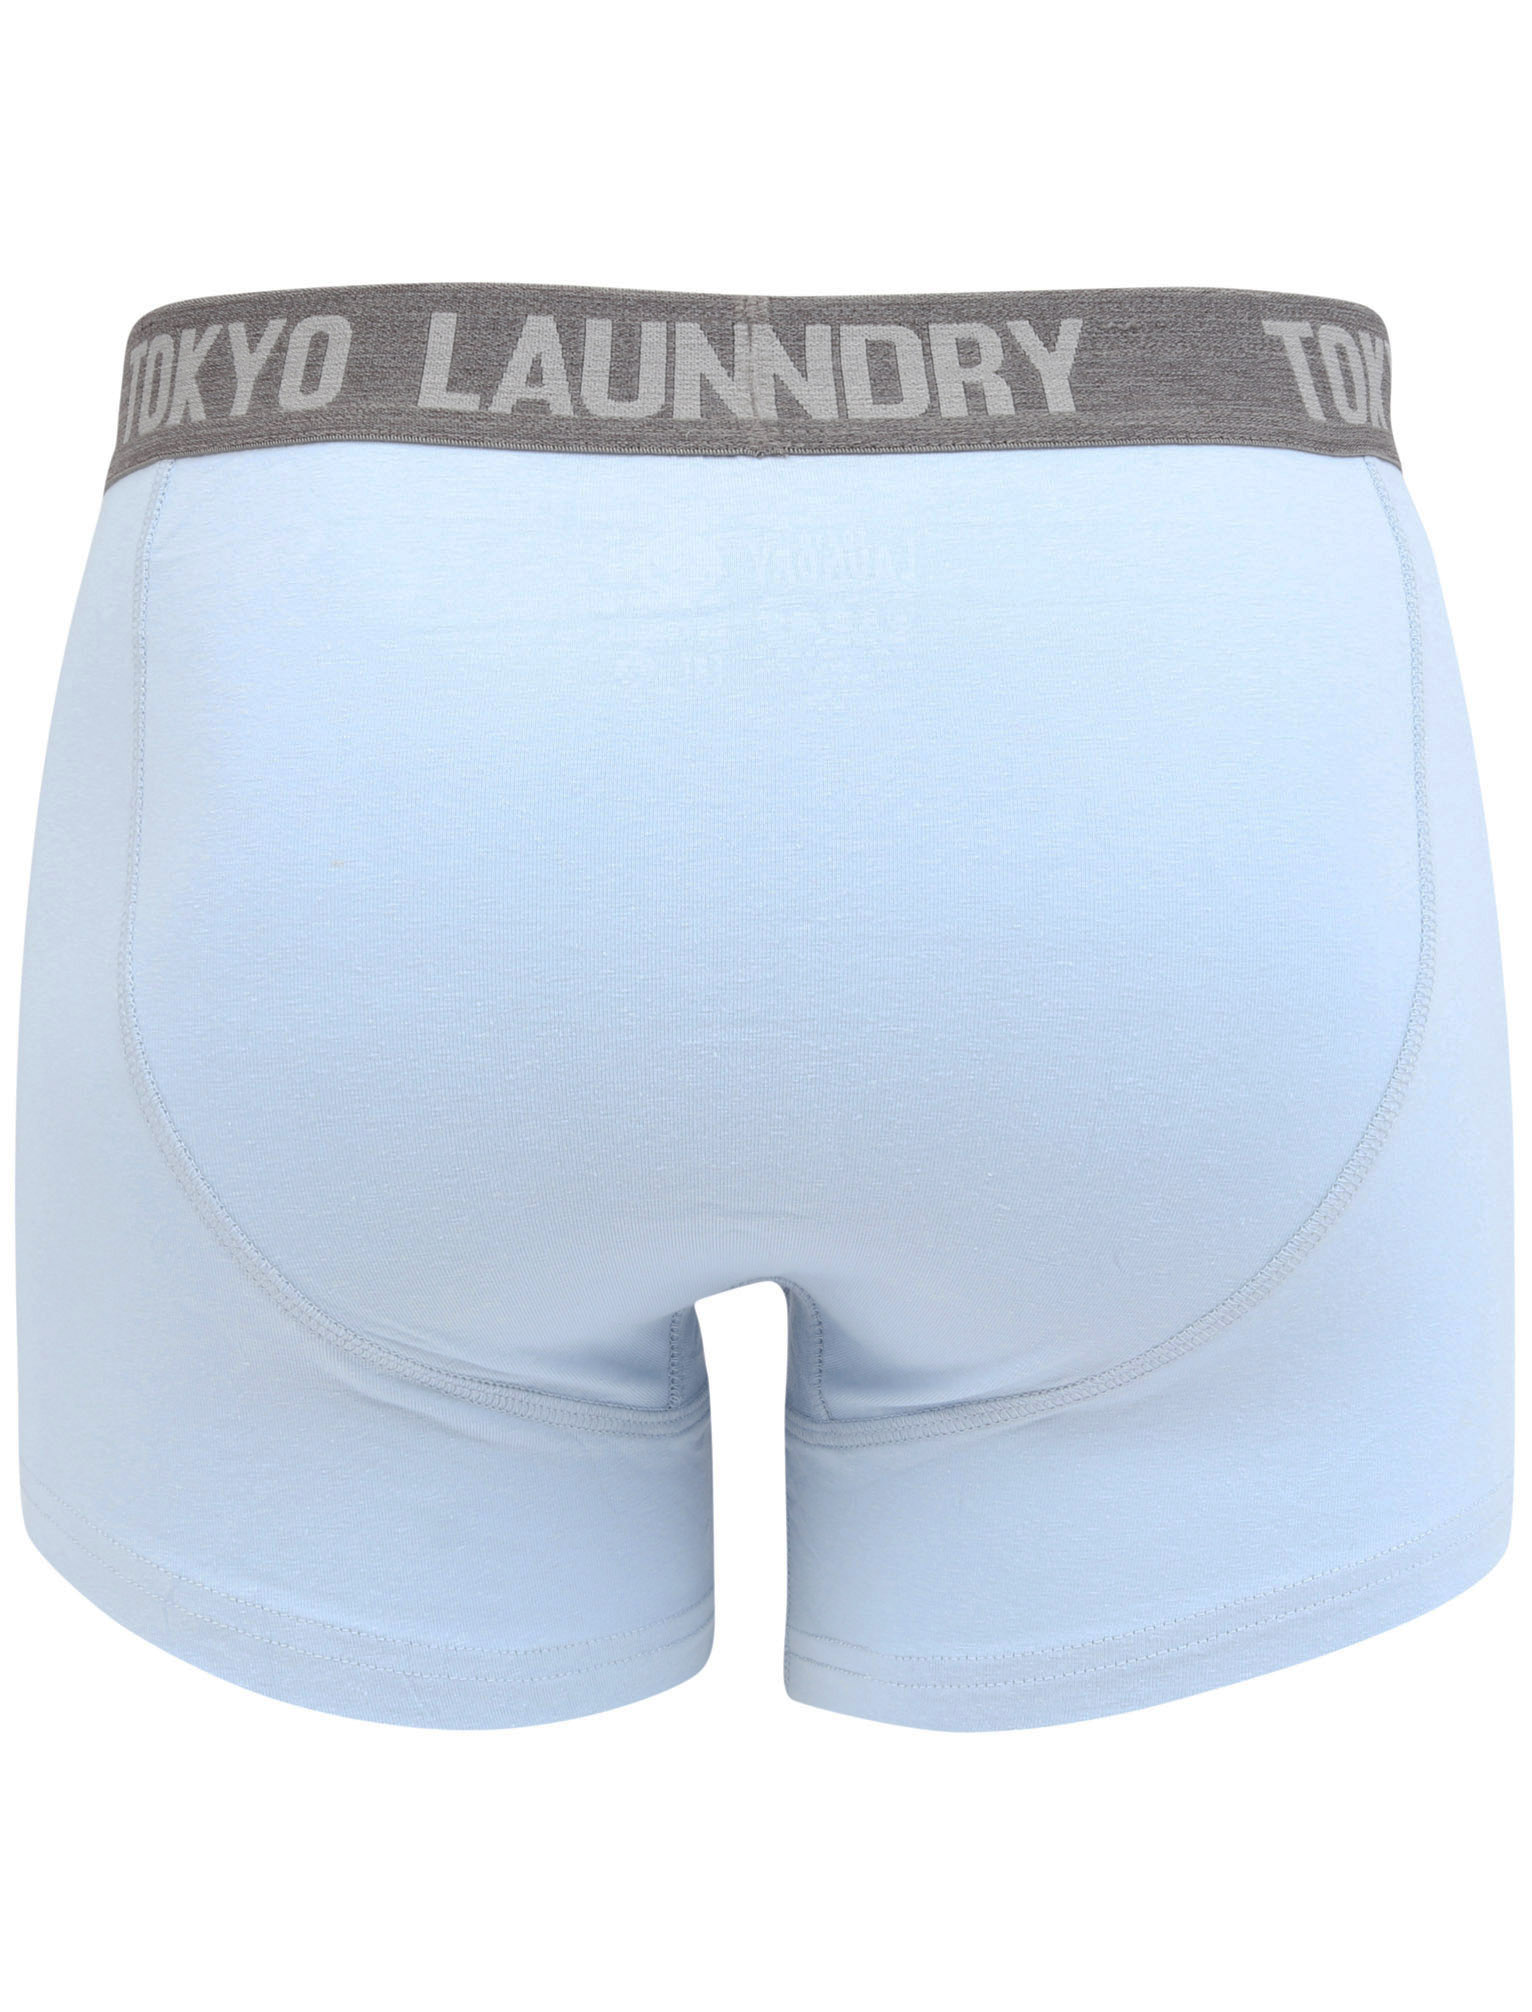 New-Mens-Tokyo-Laundry-2-Pack-Cotton-Rich-Boxer-Shorts-Set-Trunks-Size-S-XXL thumbnail 26